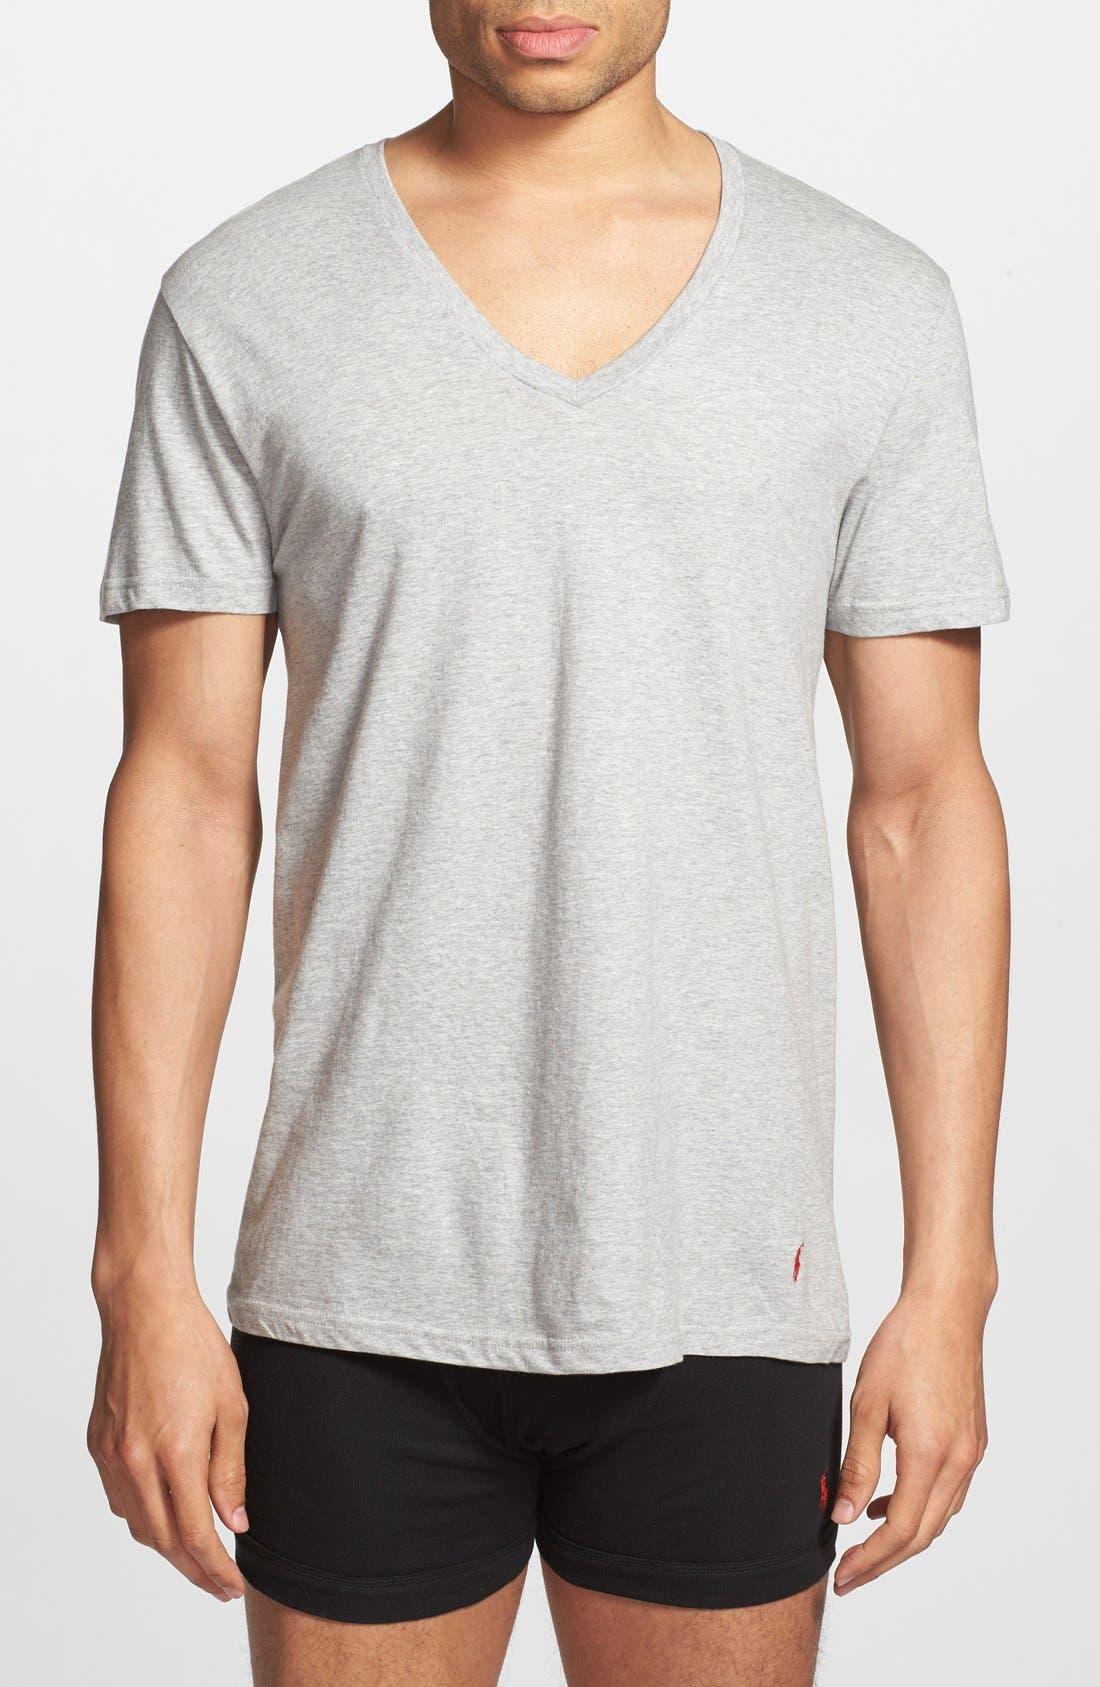 3-Pack V-Neck T-Shirts,                         Main,                         color, Black/ Grey/ Charcoal